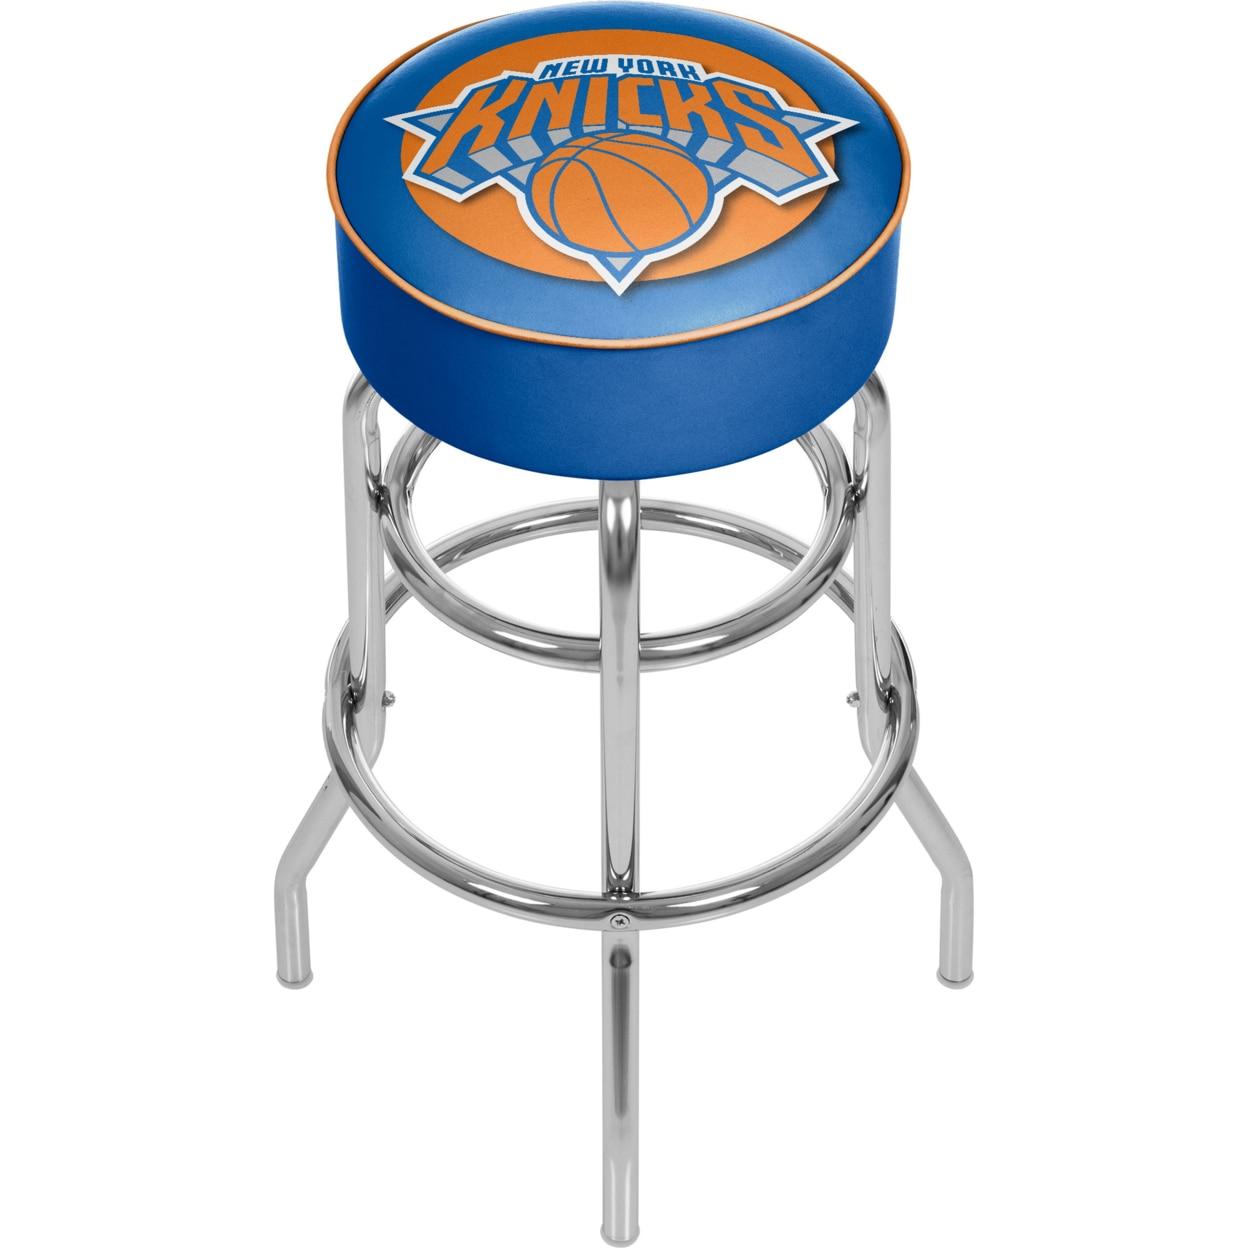 New York Knicks NBA Padded Swivel Bar Stool 30 Inches High футболка print bar new york apple